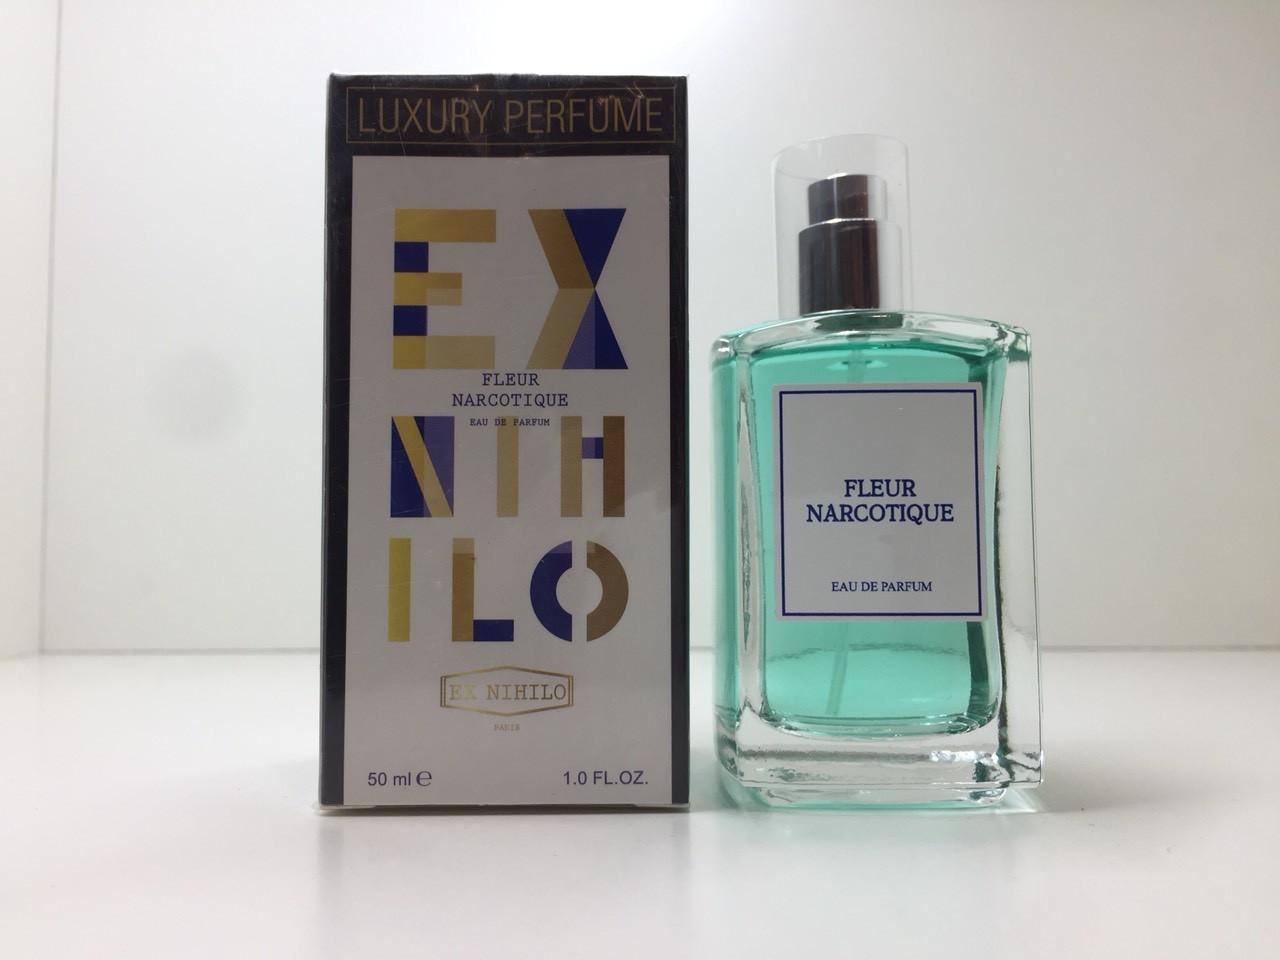 Парфюмированная вода унисекс Luxury parfume Ex Nihilo Fleur Narcotique (Экс нихило) 50 мл